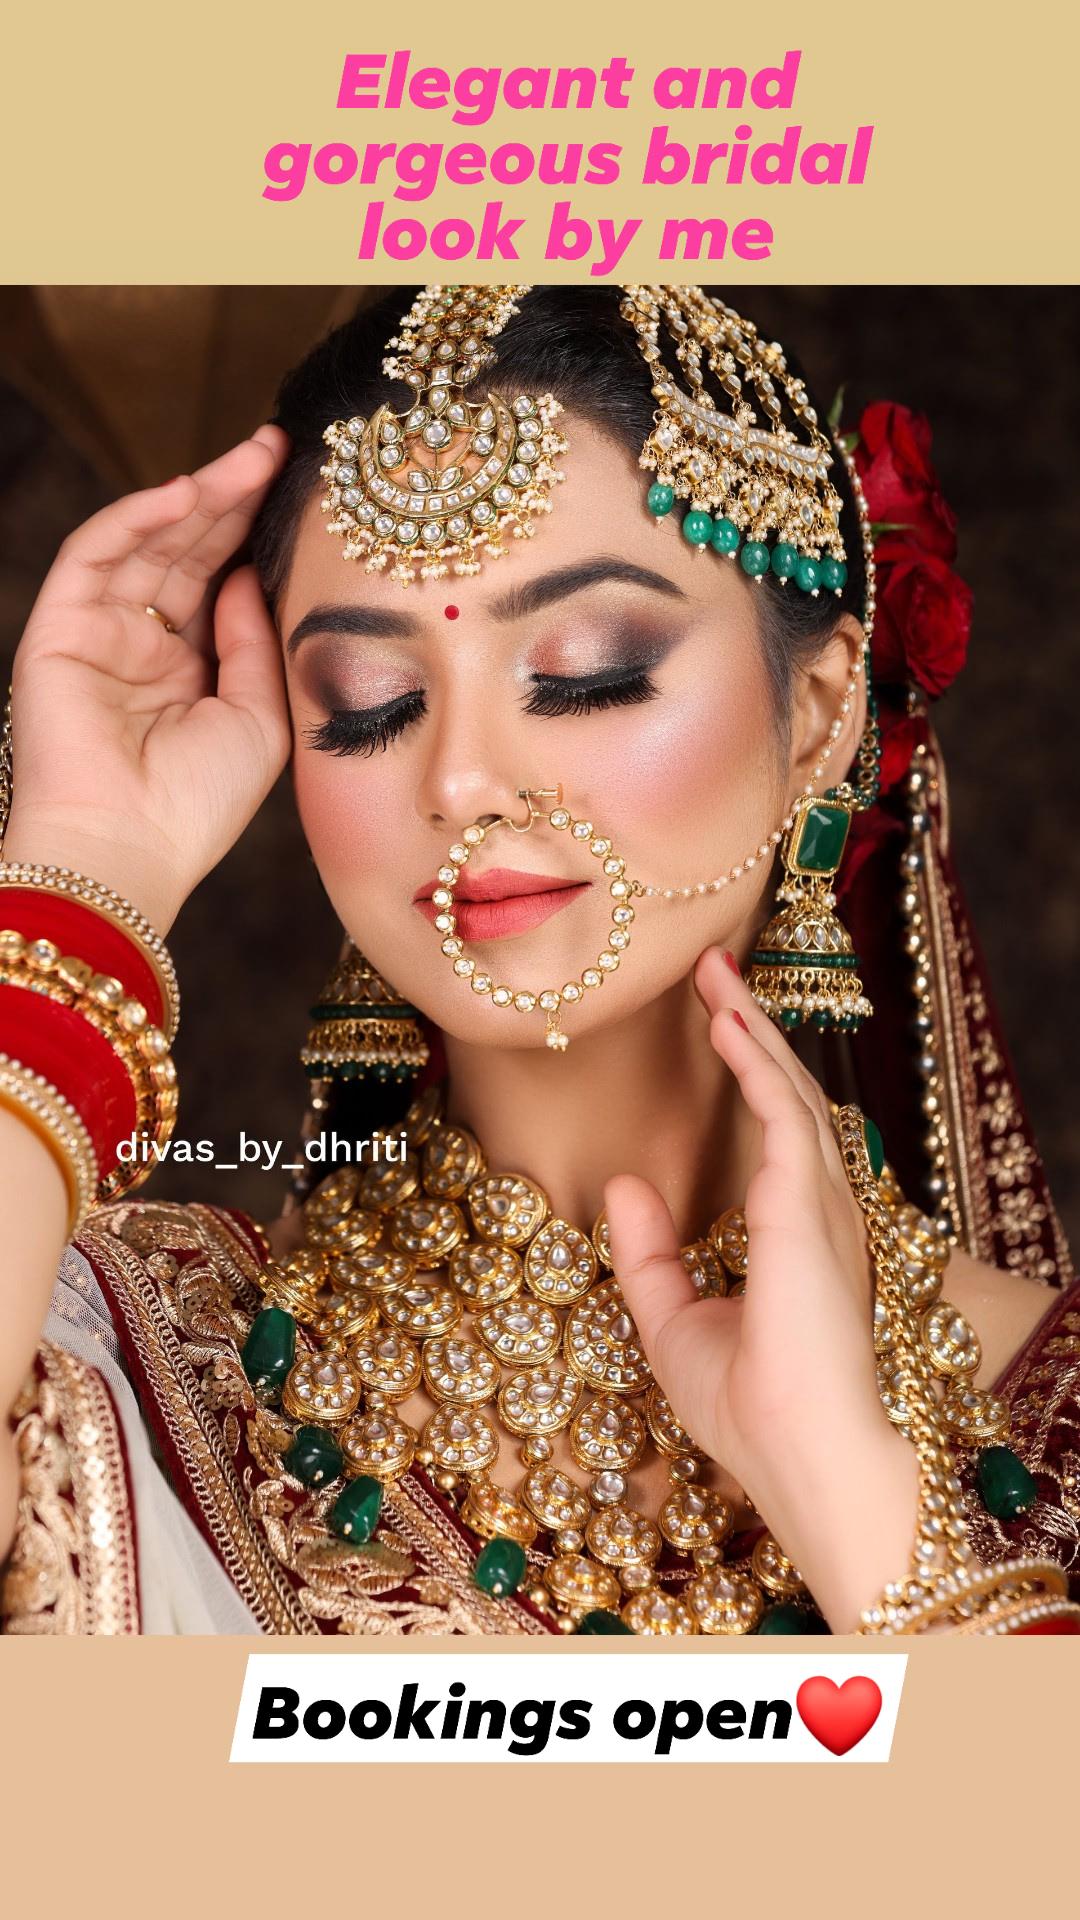 dhriti-wahi-makeup-artist-delhi-ncr